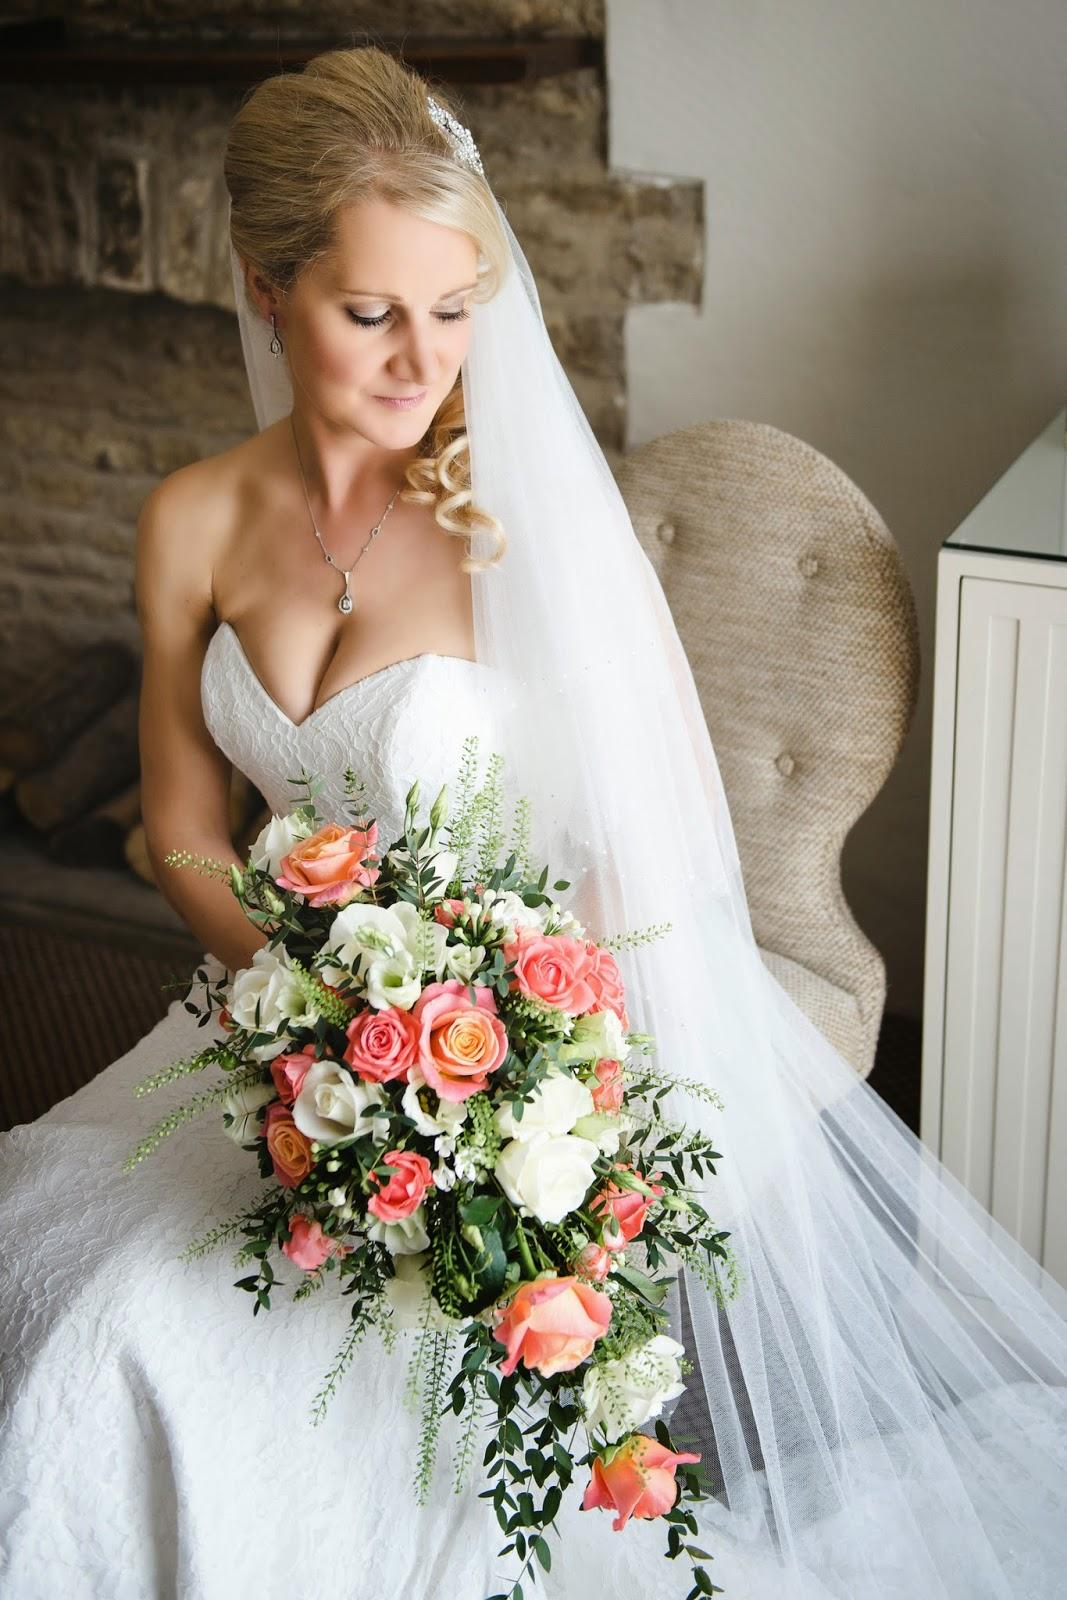 Wedding Flowers Blenheim Palace Orangery, Joanna Carter Wedding Flowers, Oxford, Oxfordshire, Buckinghamshire, Berkshire and London